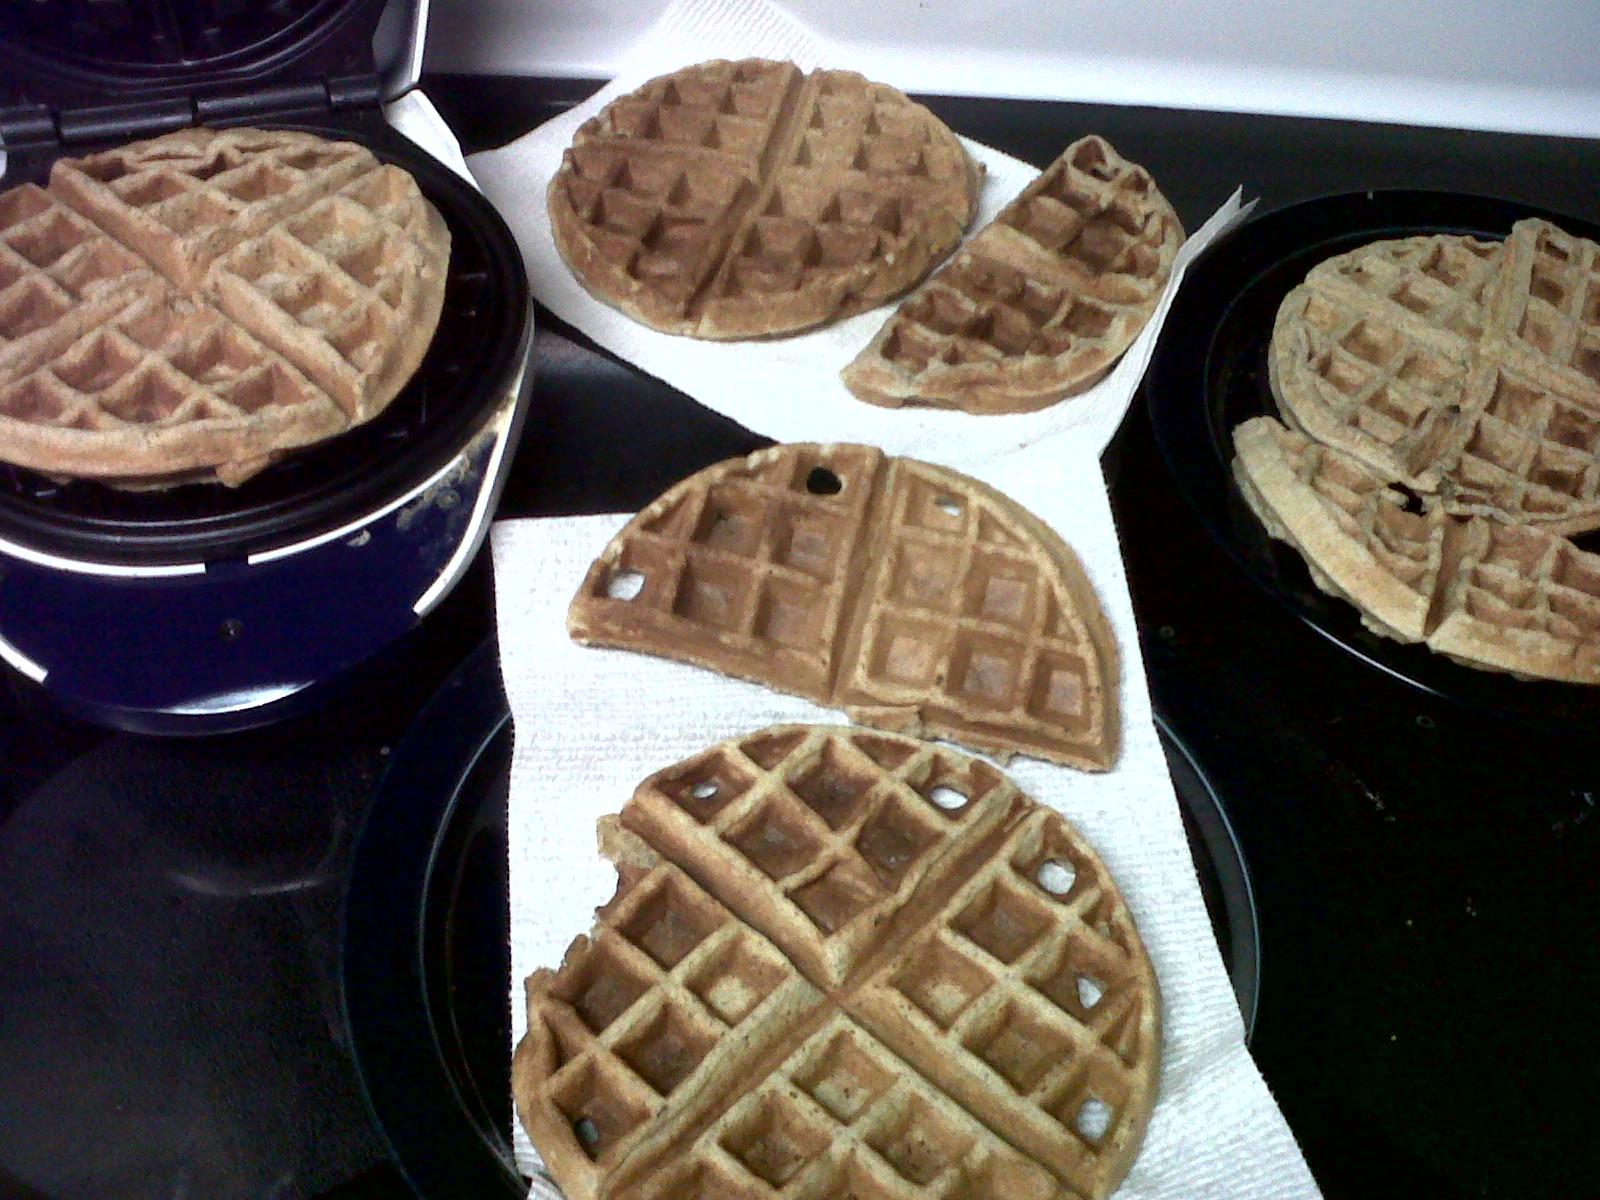 ... Crocodile: Sour Cream Oat And Buckwheat Flour (Gluten Free) Waffles